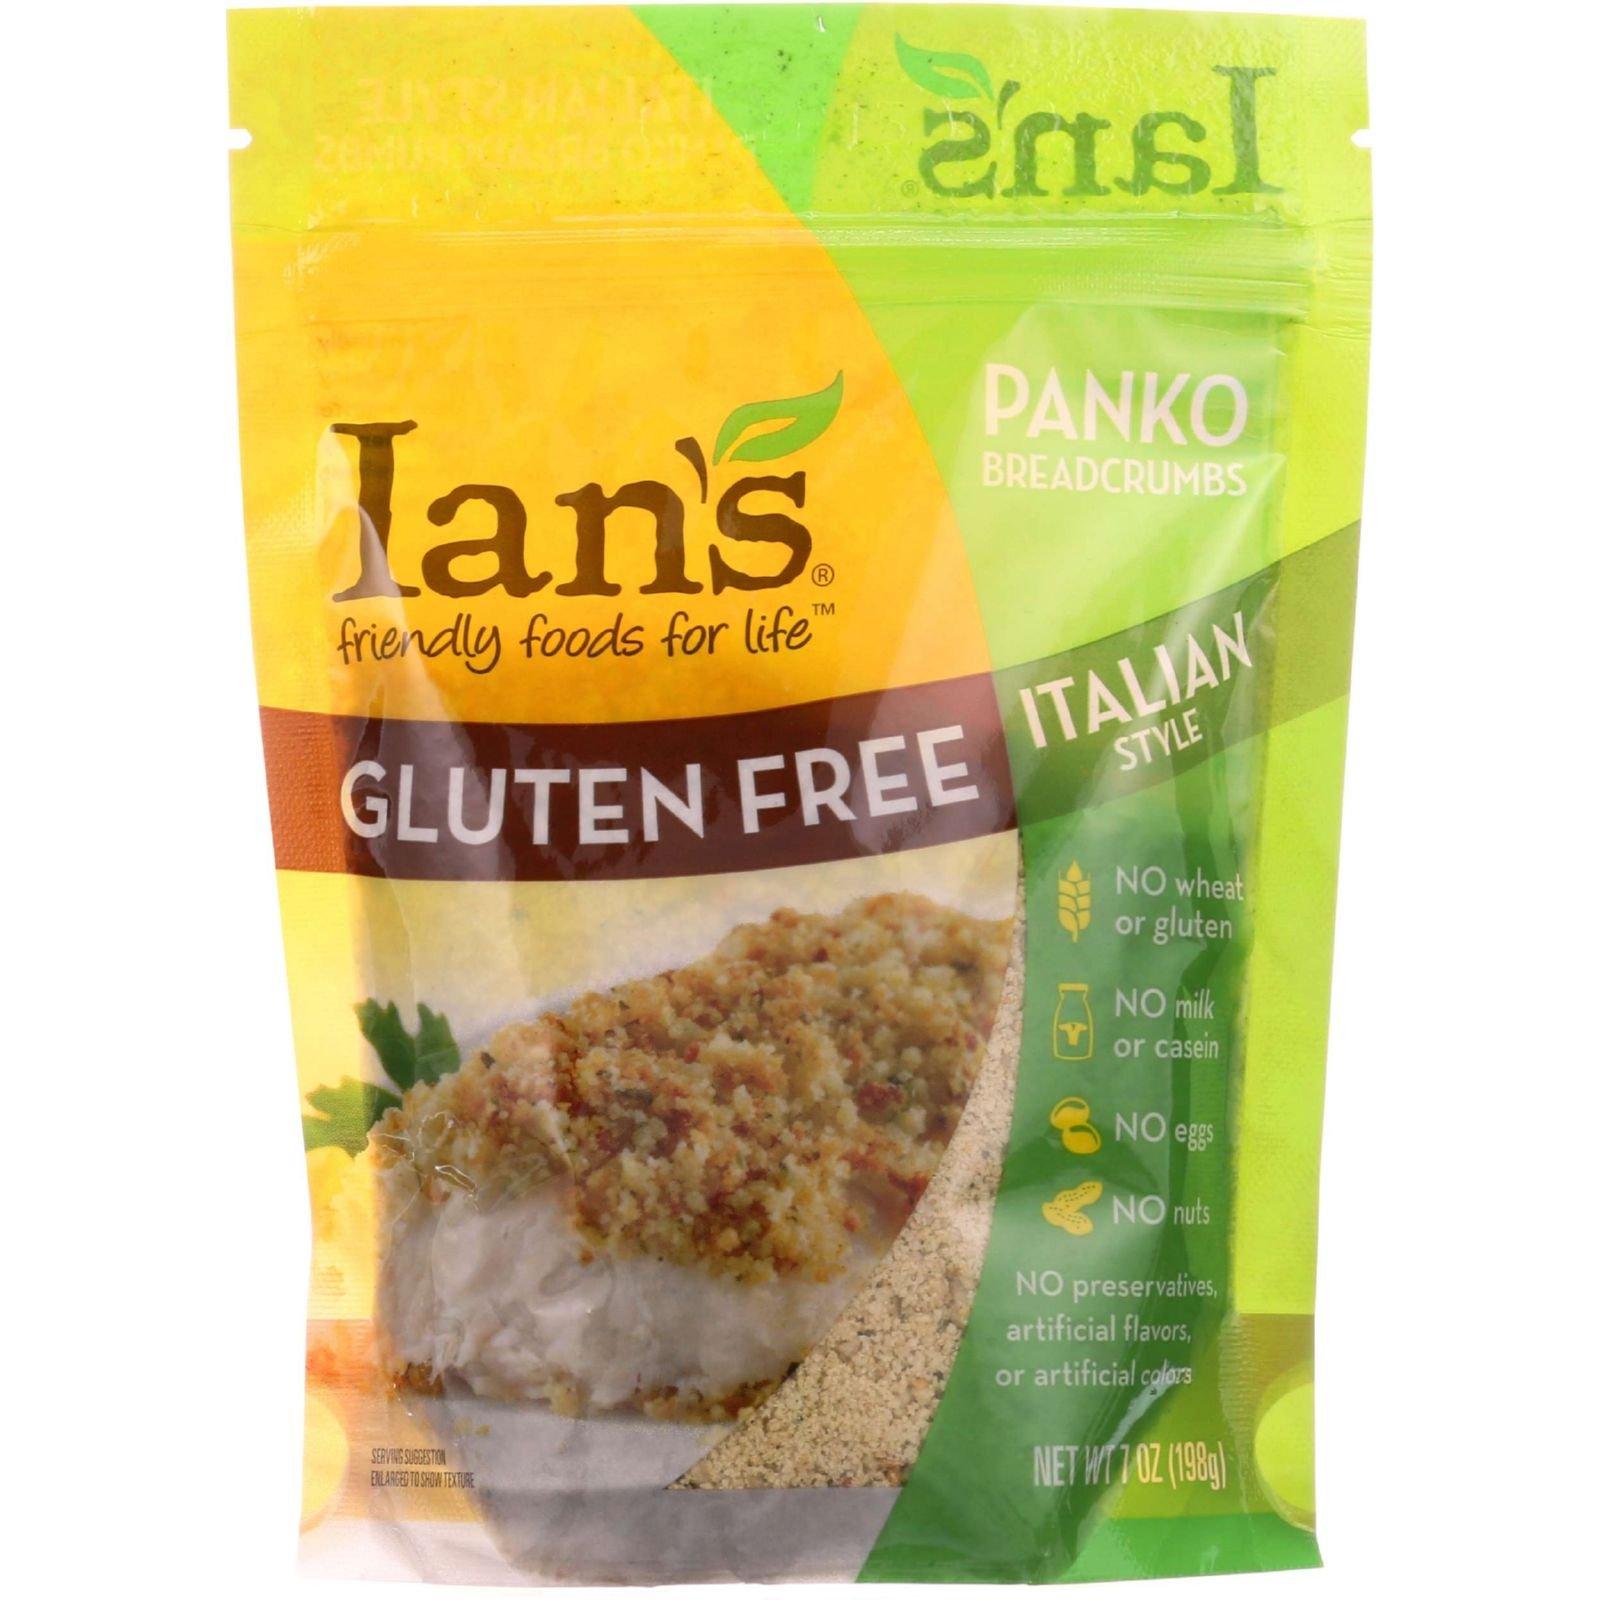 Ians Natural Foods Bread Crumbs - Panko - Italian Style - Gluten Free - 7 oz - case of 8 - Gluten Free - Dairy Free - Wheat Free by Ian's Natural Foods